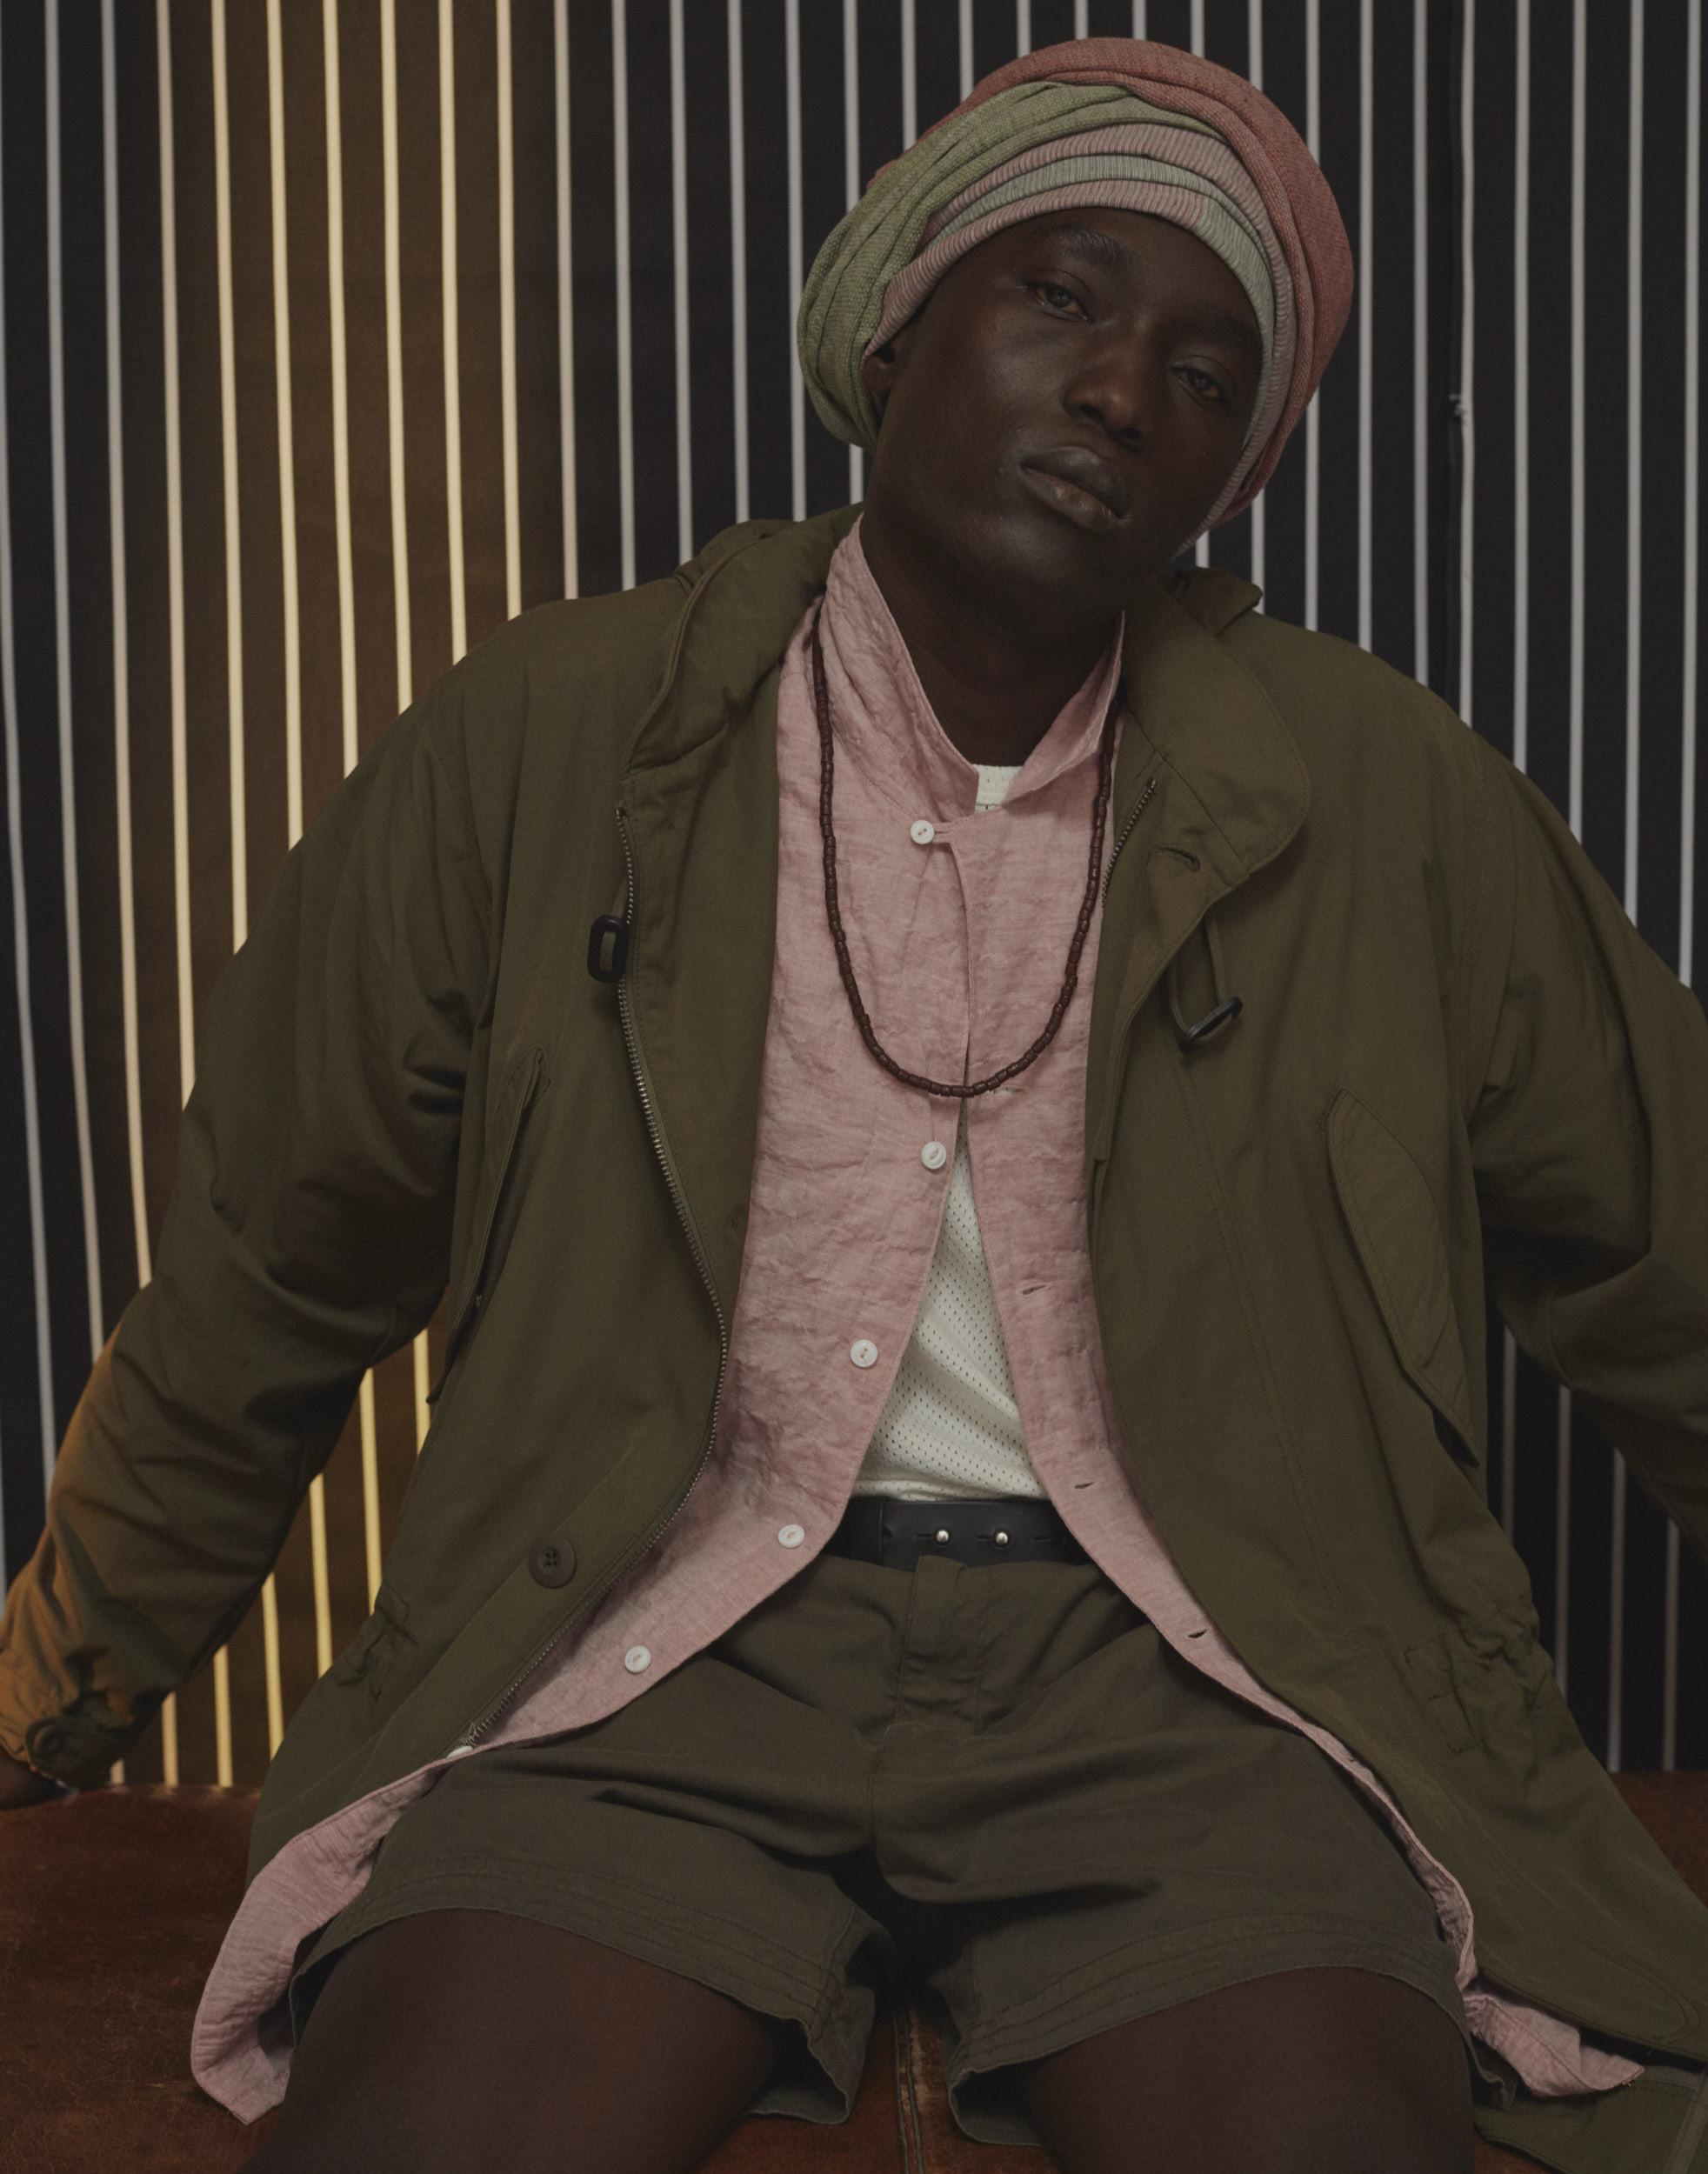 ymc-ss17-collection-okoro-men-fashion-folkr-7